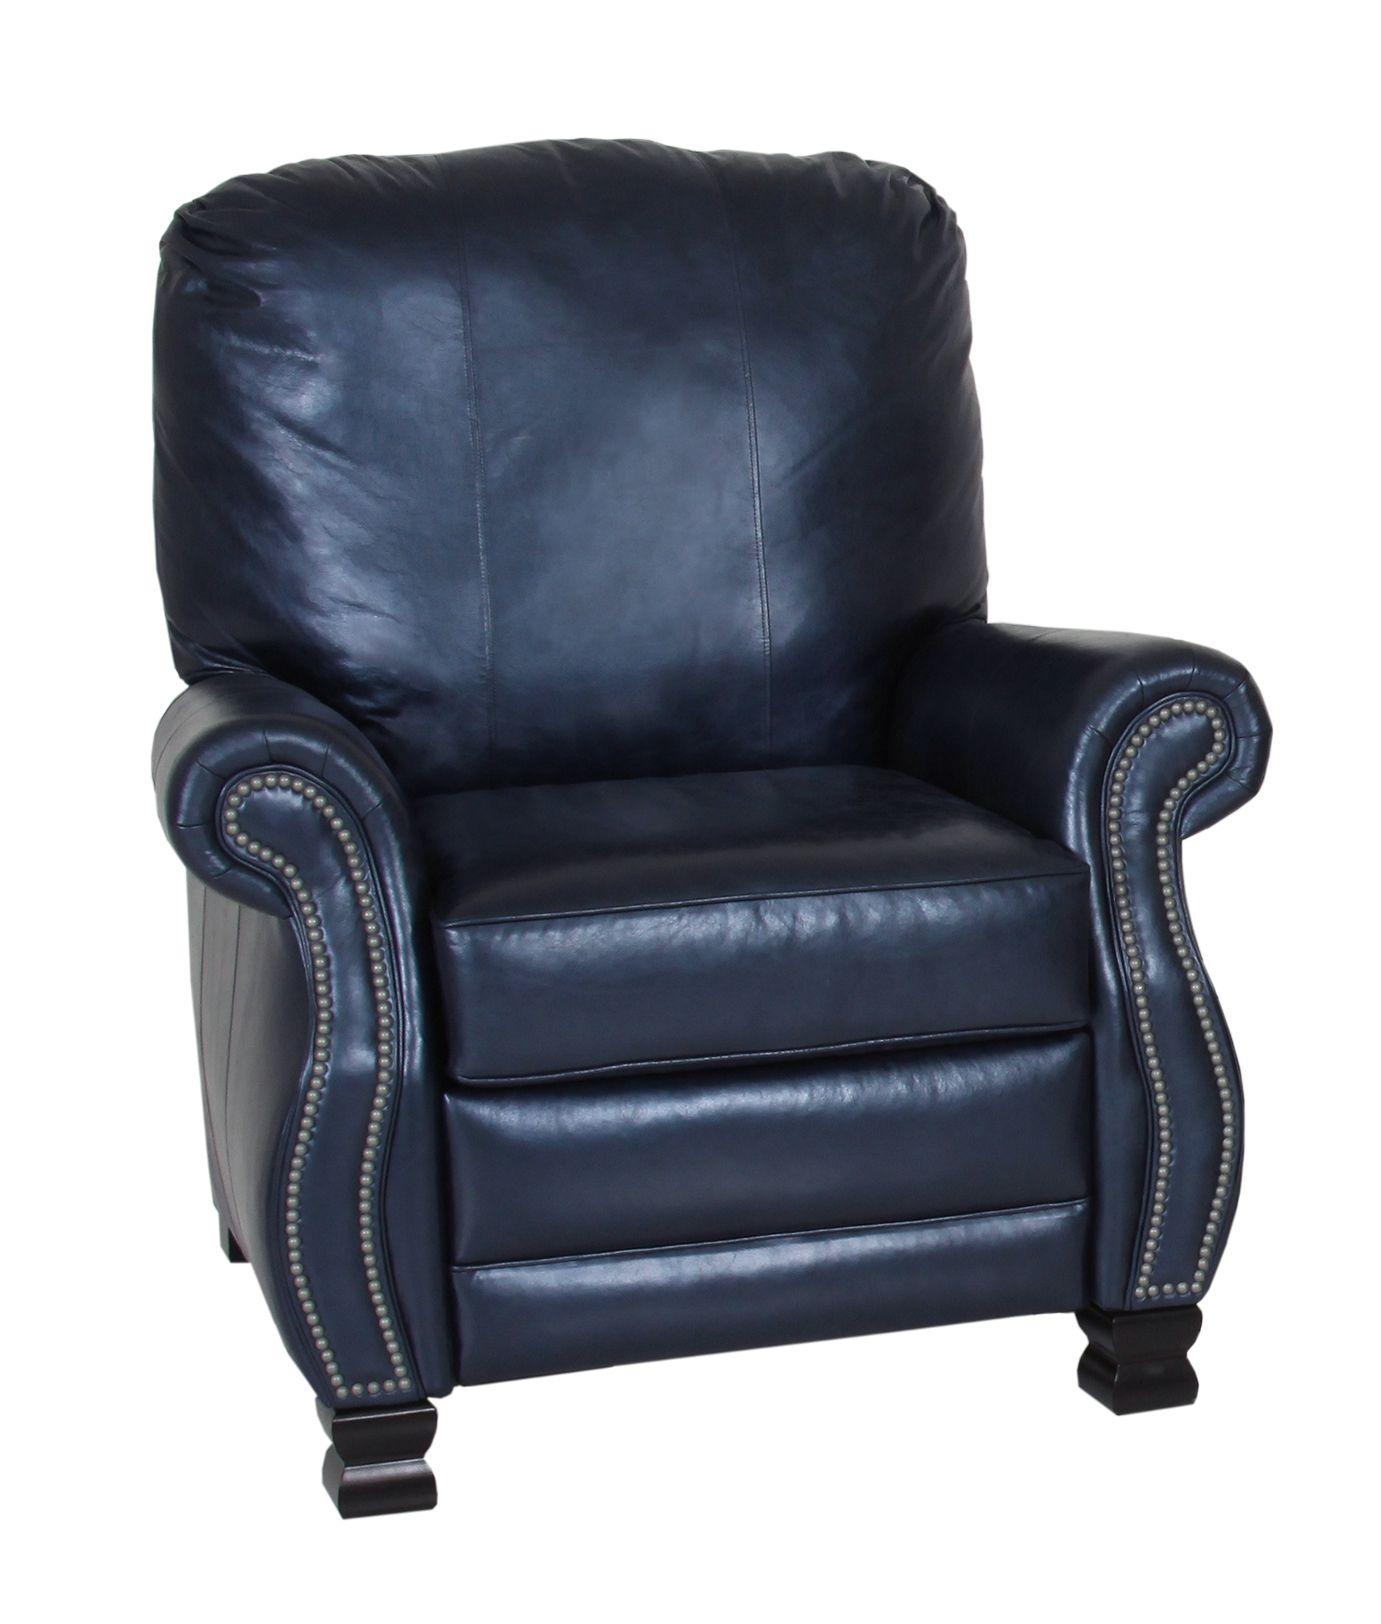 Norwalk Furniture Birmingham Leather Recliner